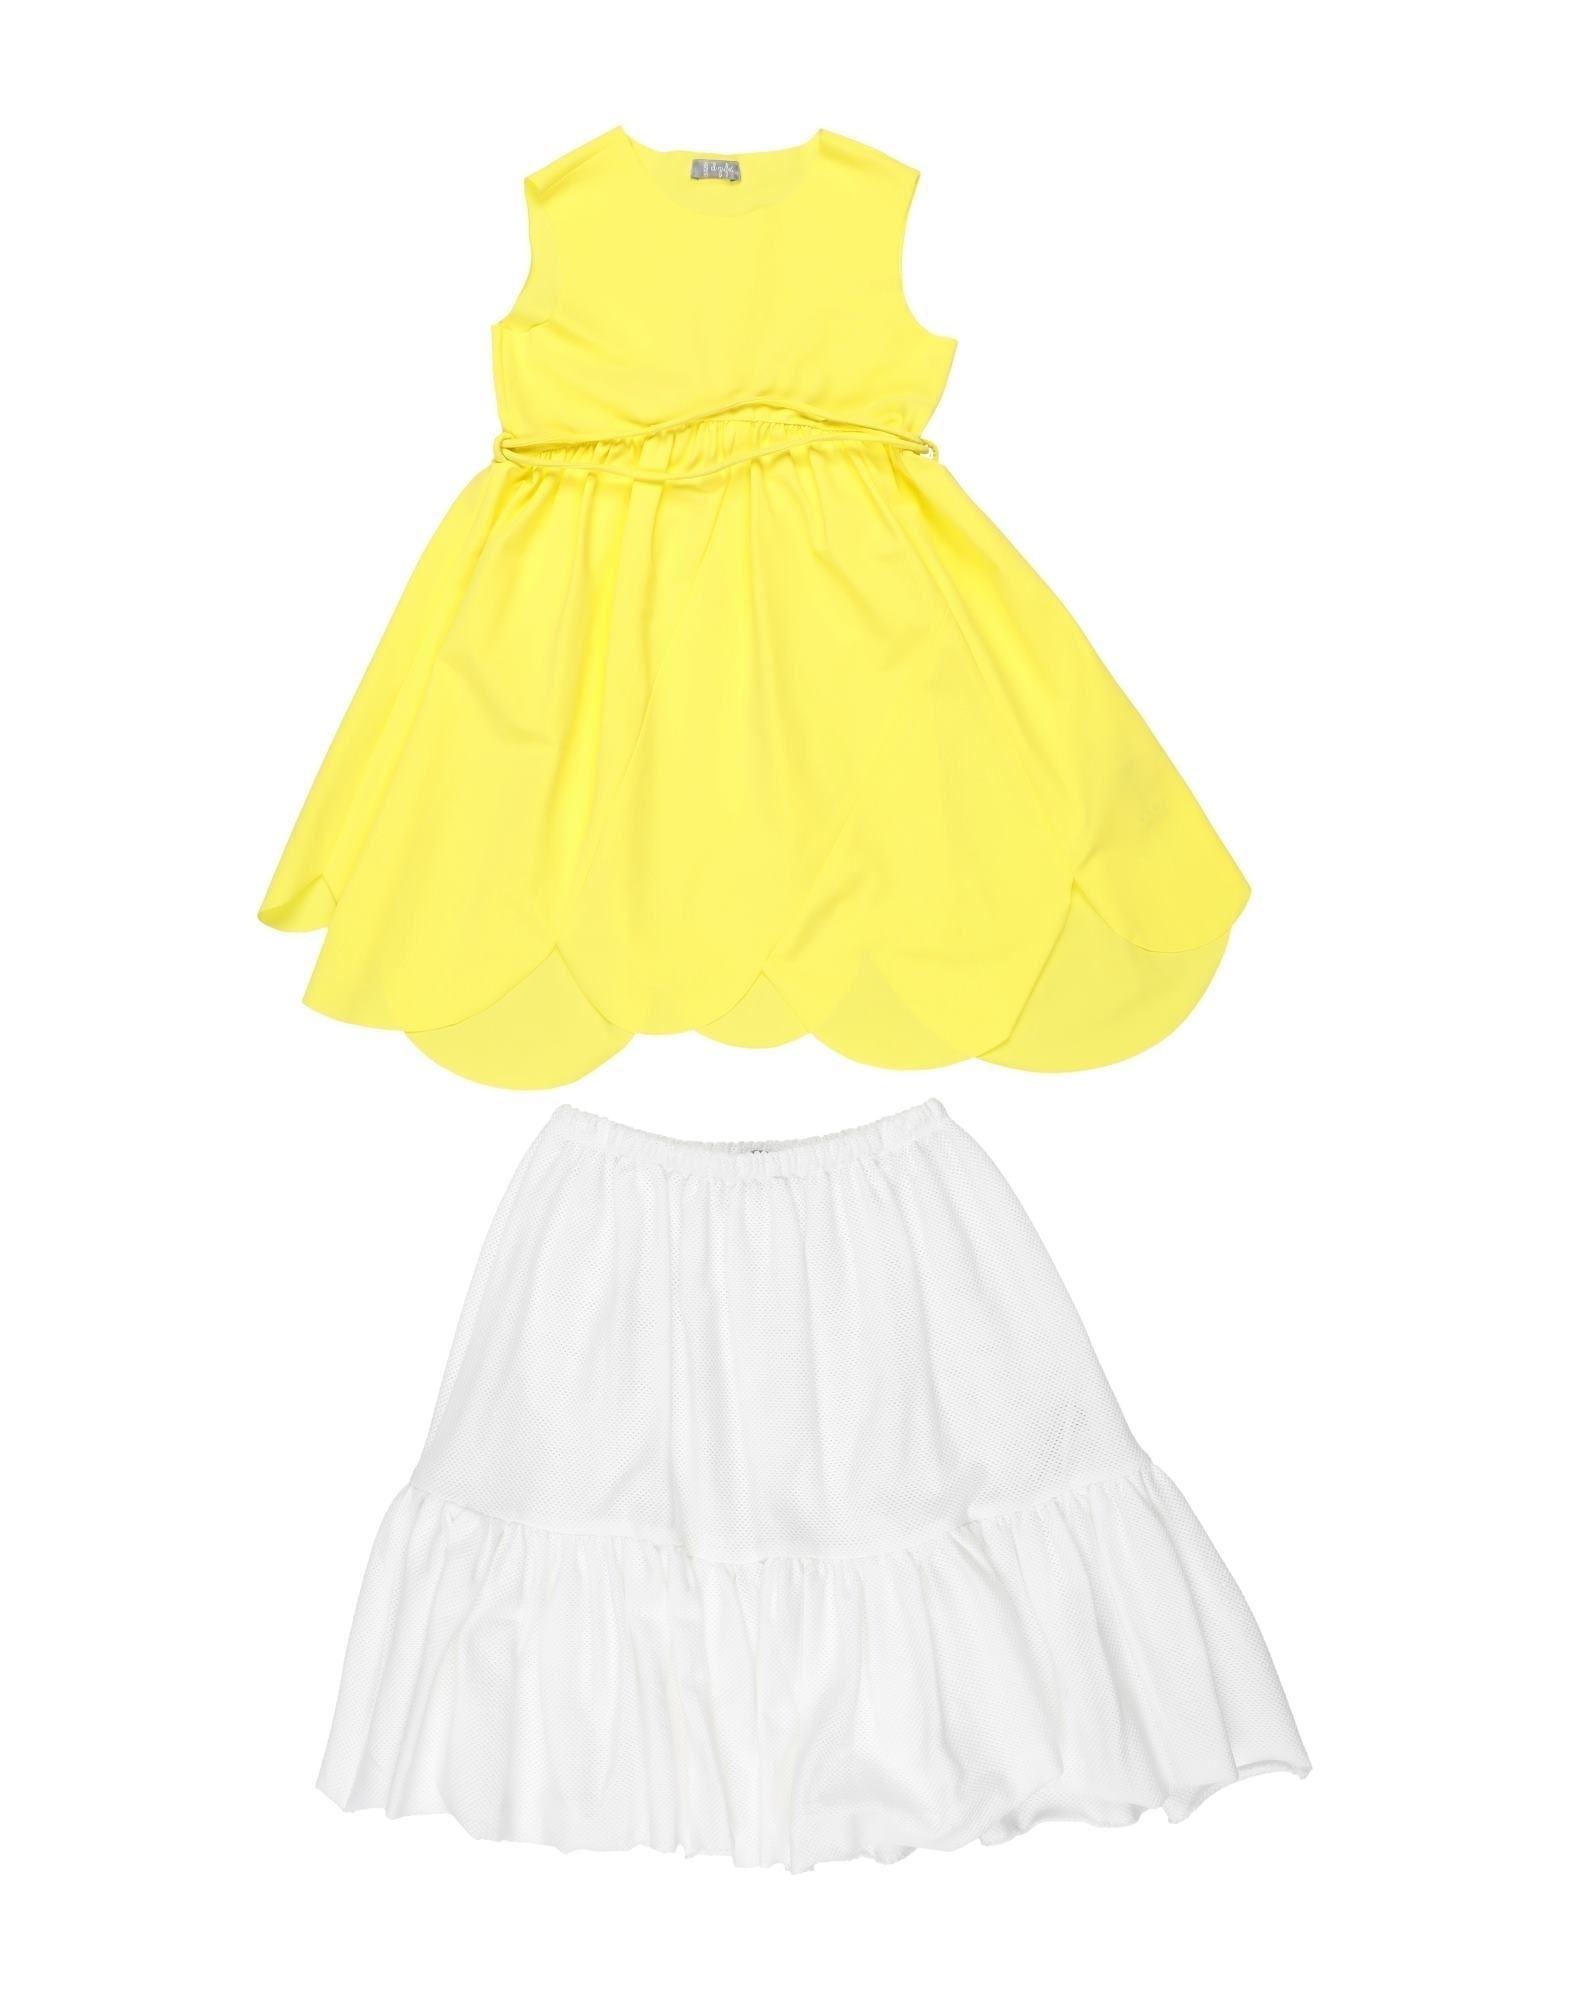 IL GUFO Детское платье комплект одежды il gufo размер 110 белый